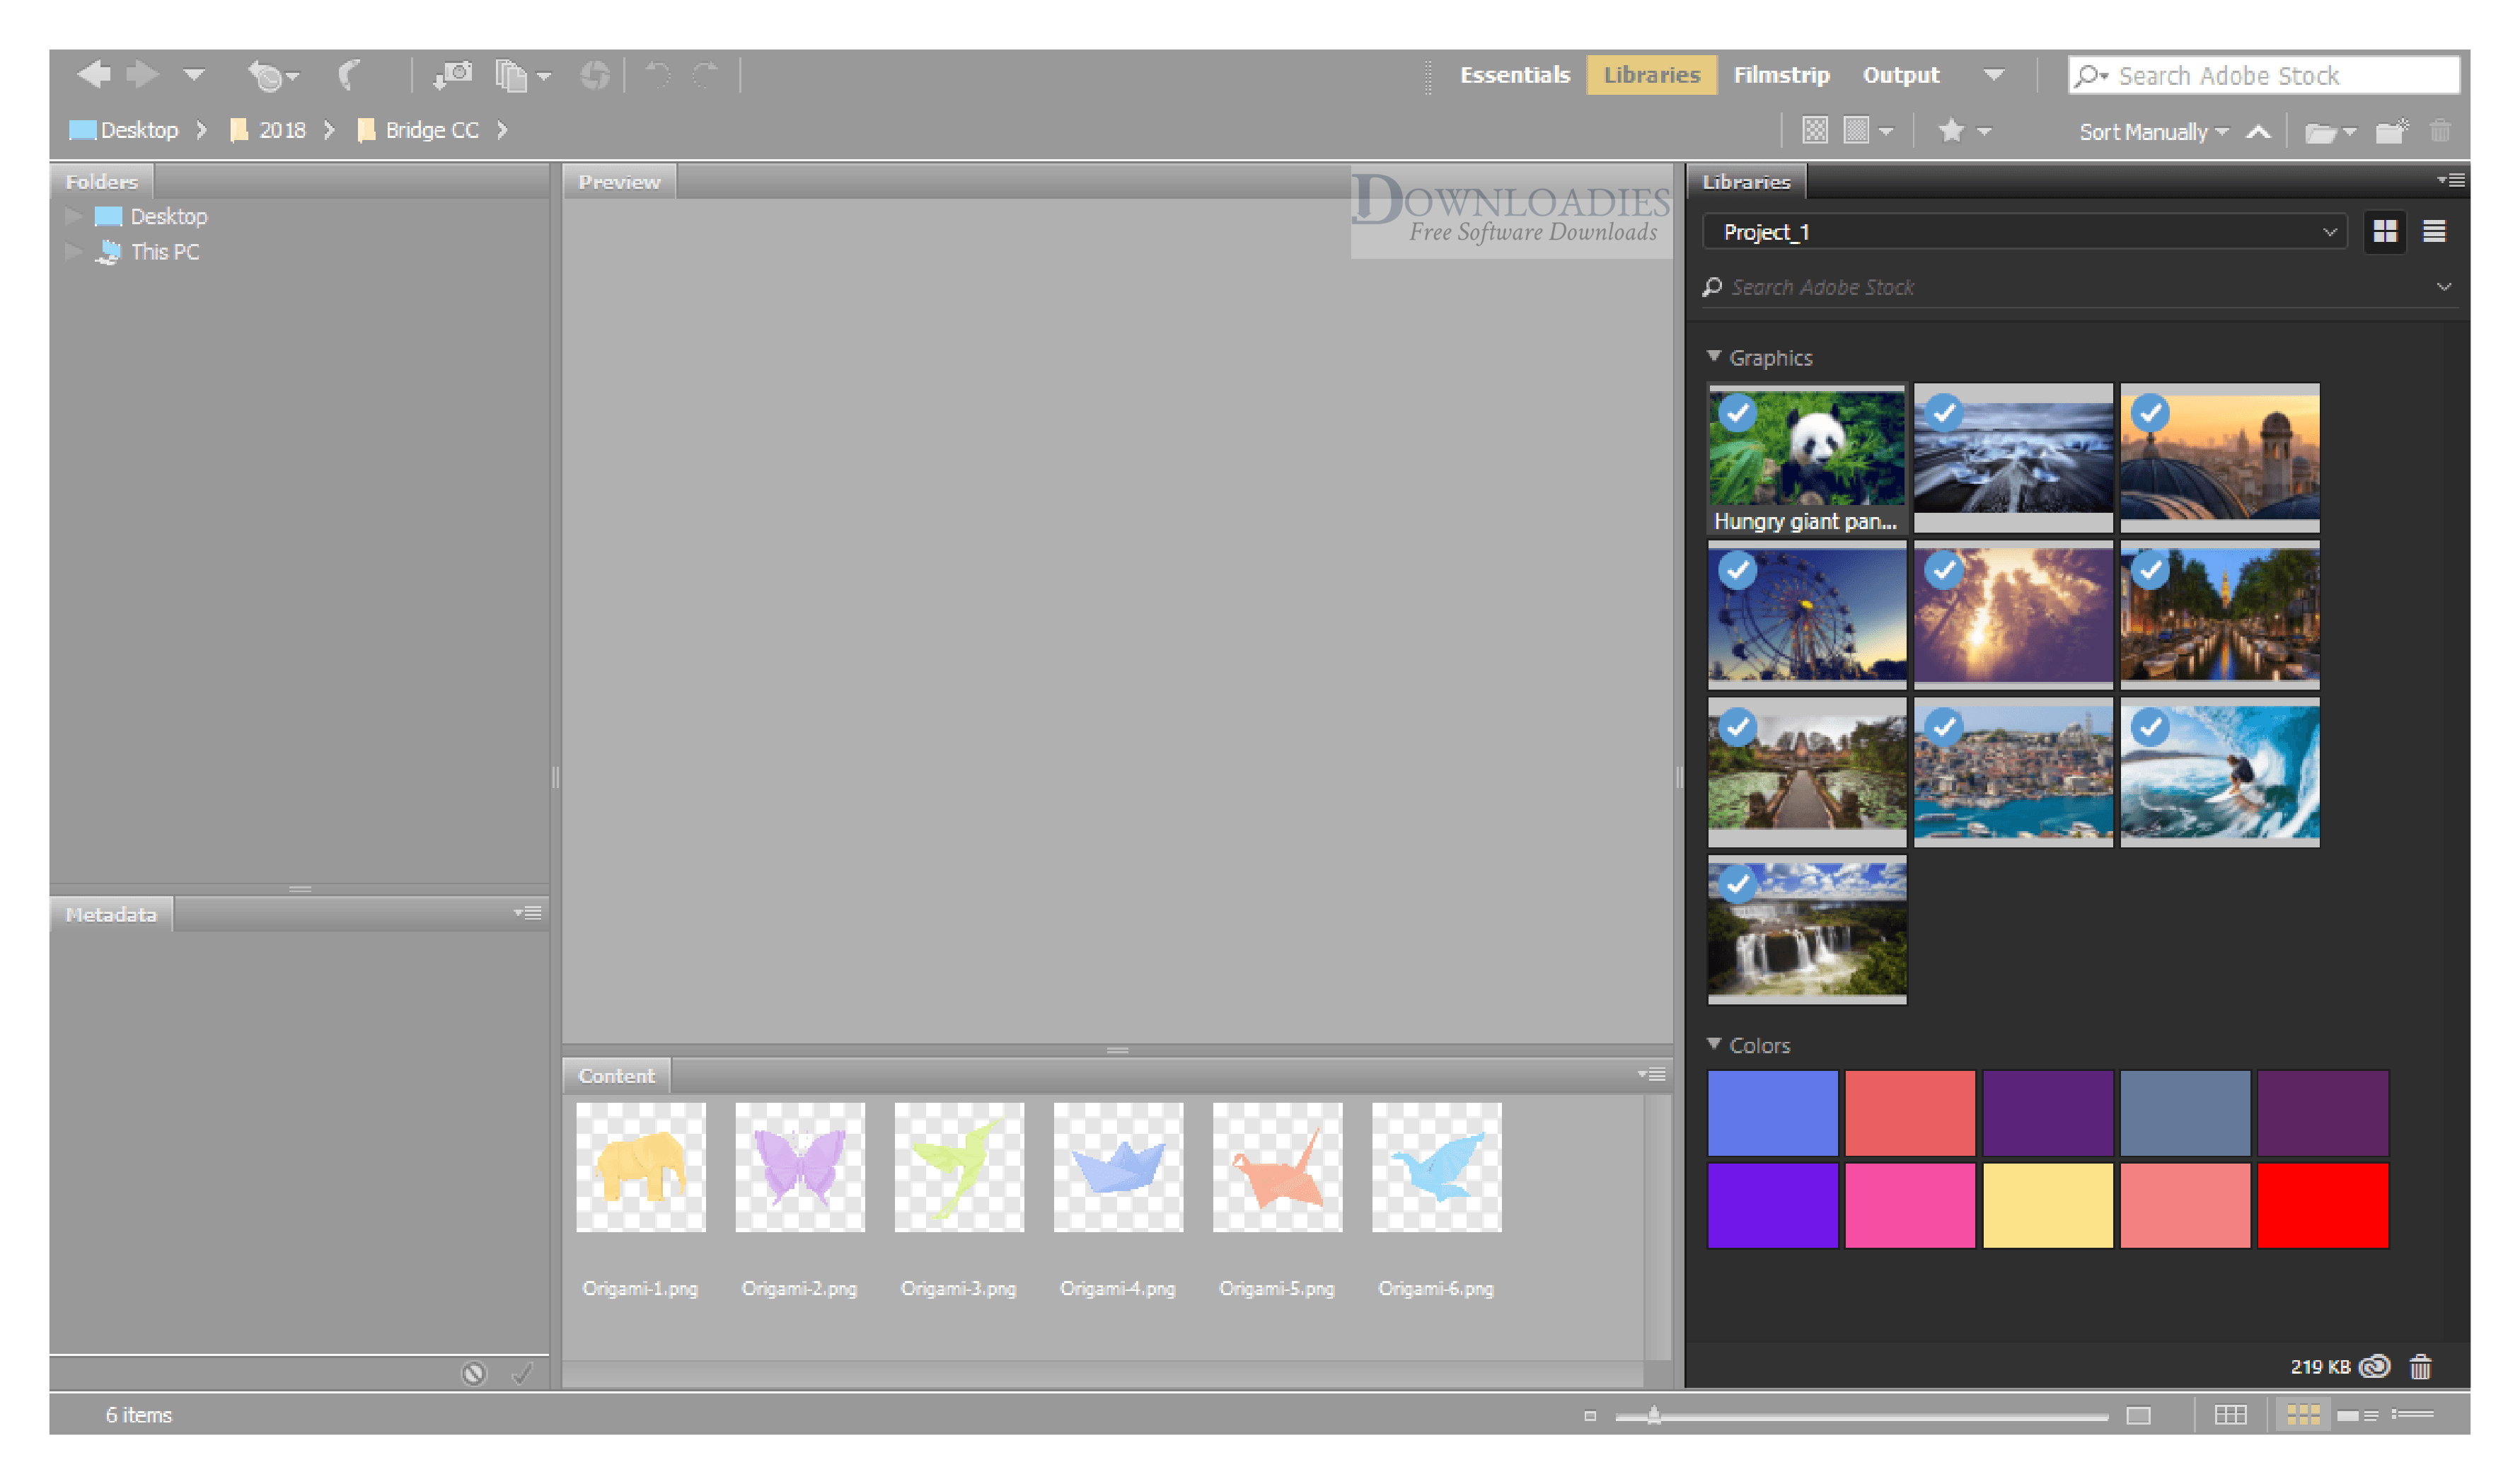 Adobe Bridge CC 2019 v9.1 for Mac Free Download free